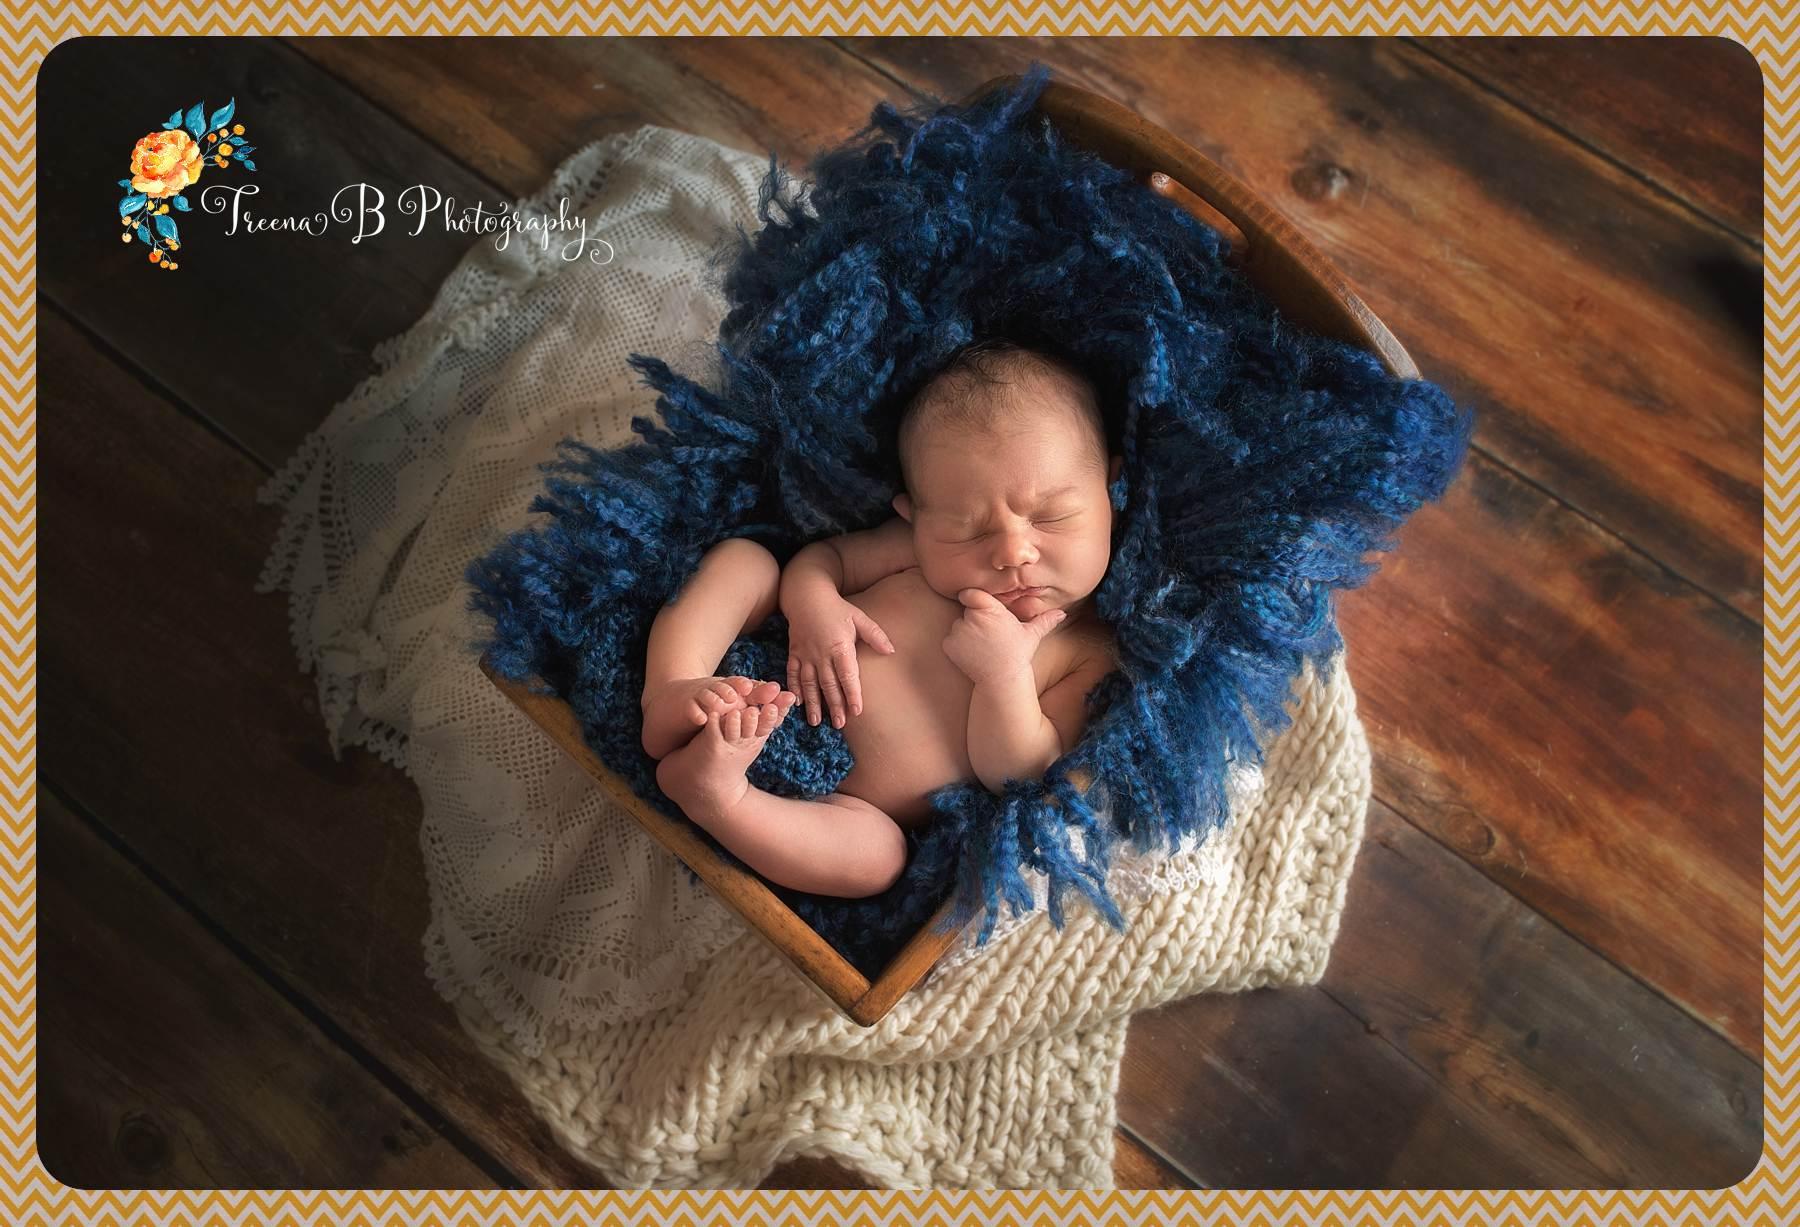 Treena B Photography Newborn in Cradle Omaha Photographer